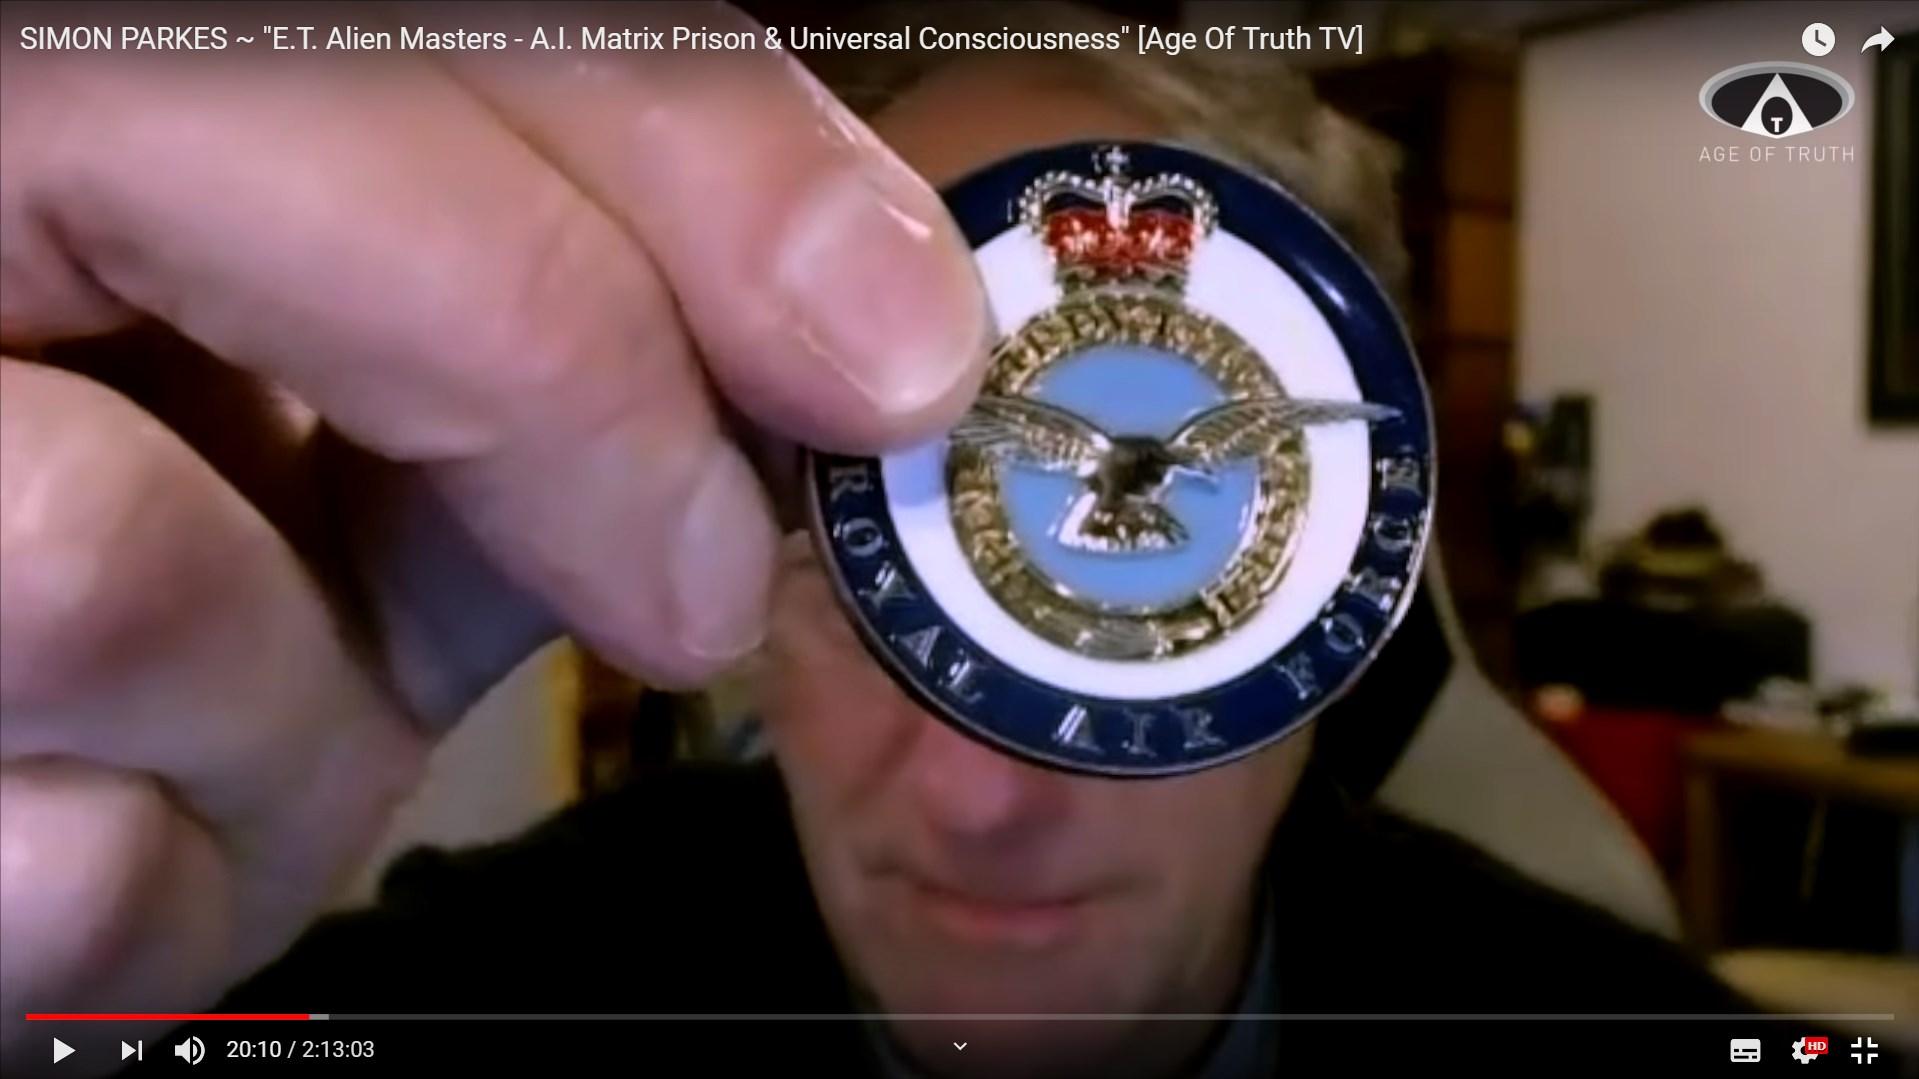 Интервью Саймона Паркса для Age of Truth TV с Лукасом Александром (15 апреля 2019 г.) KT6z-pMyczE